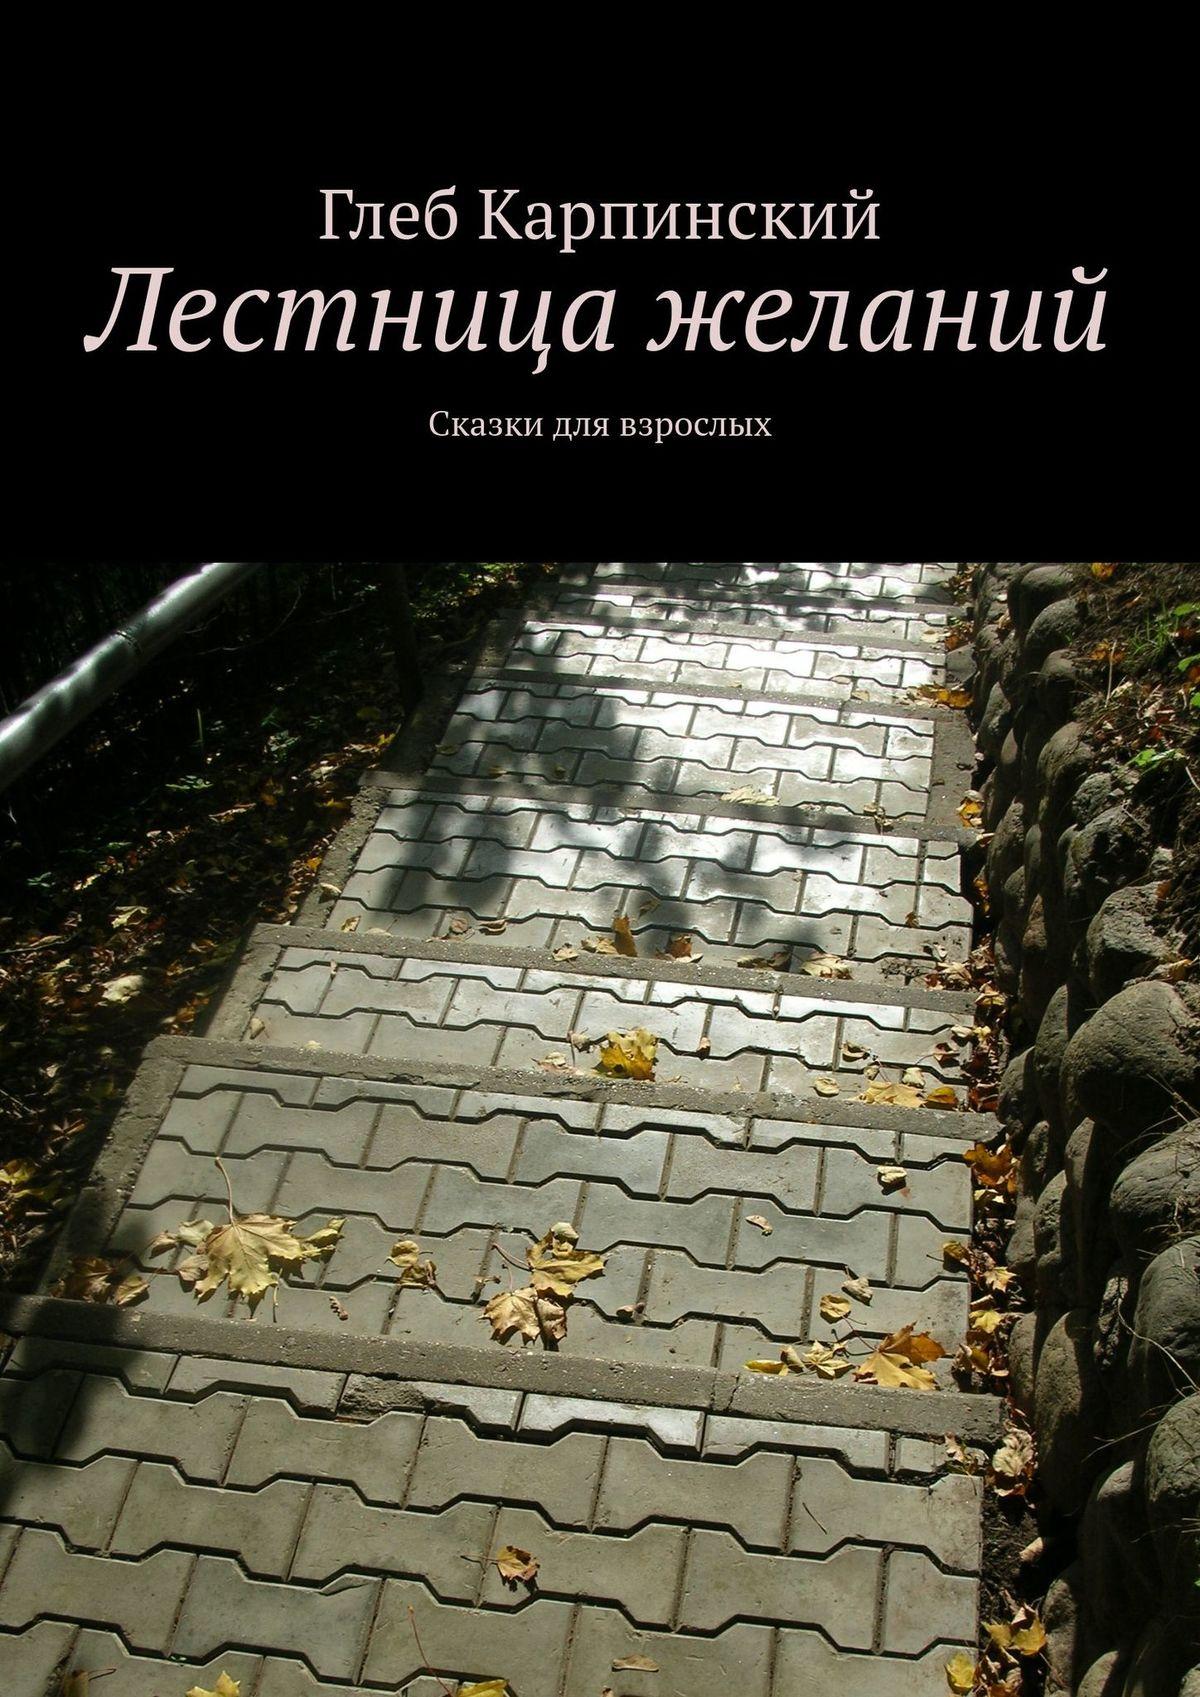 Глеб Карпинский Лестница желаний. Сказки для взрослых цена и фото